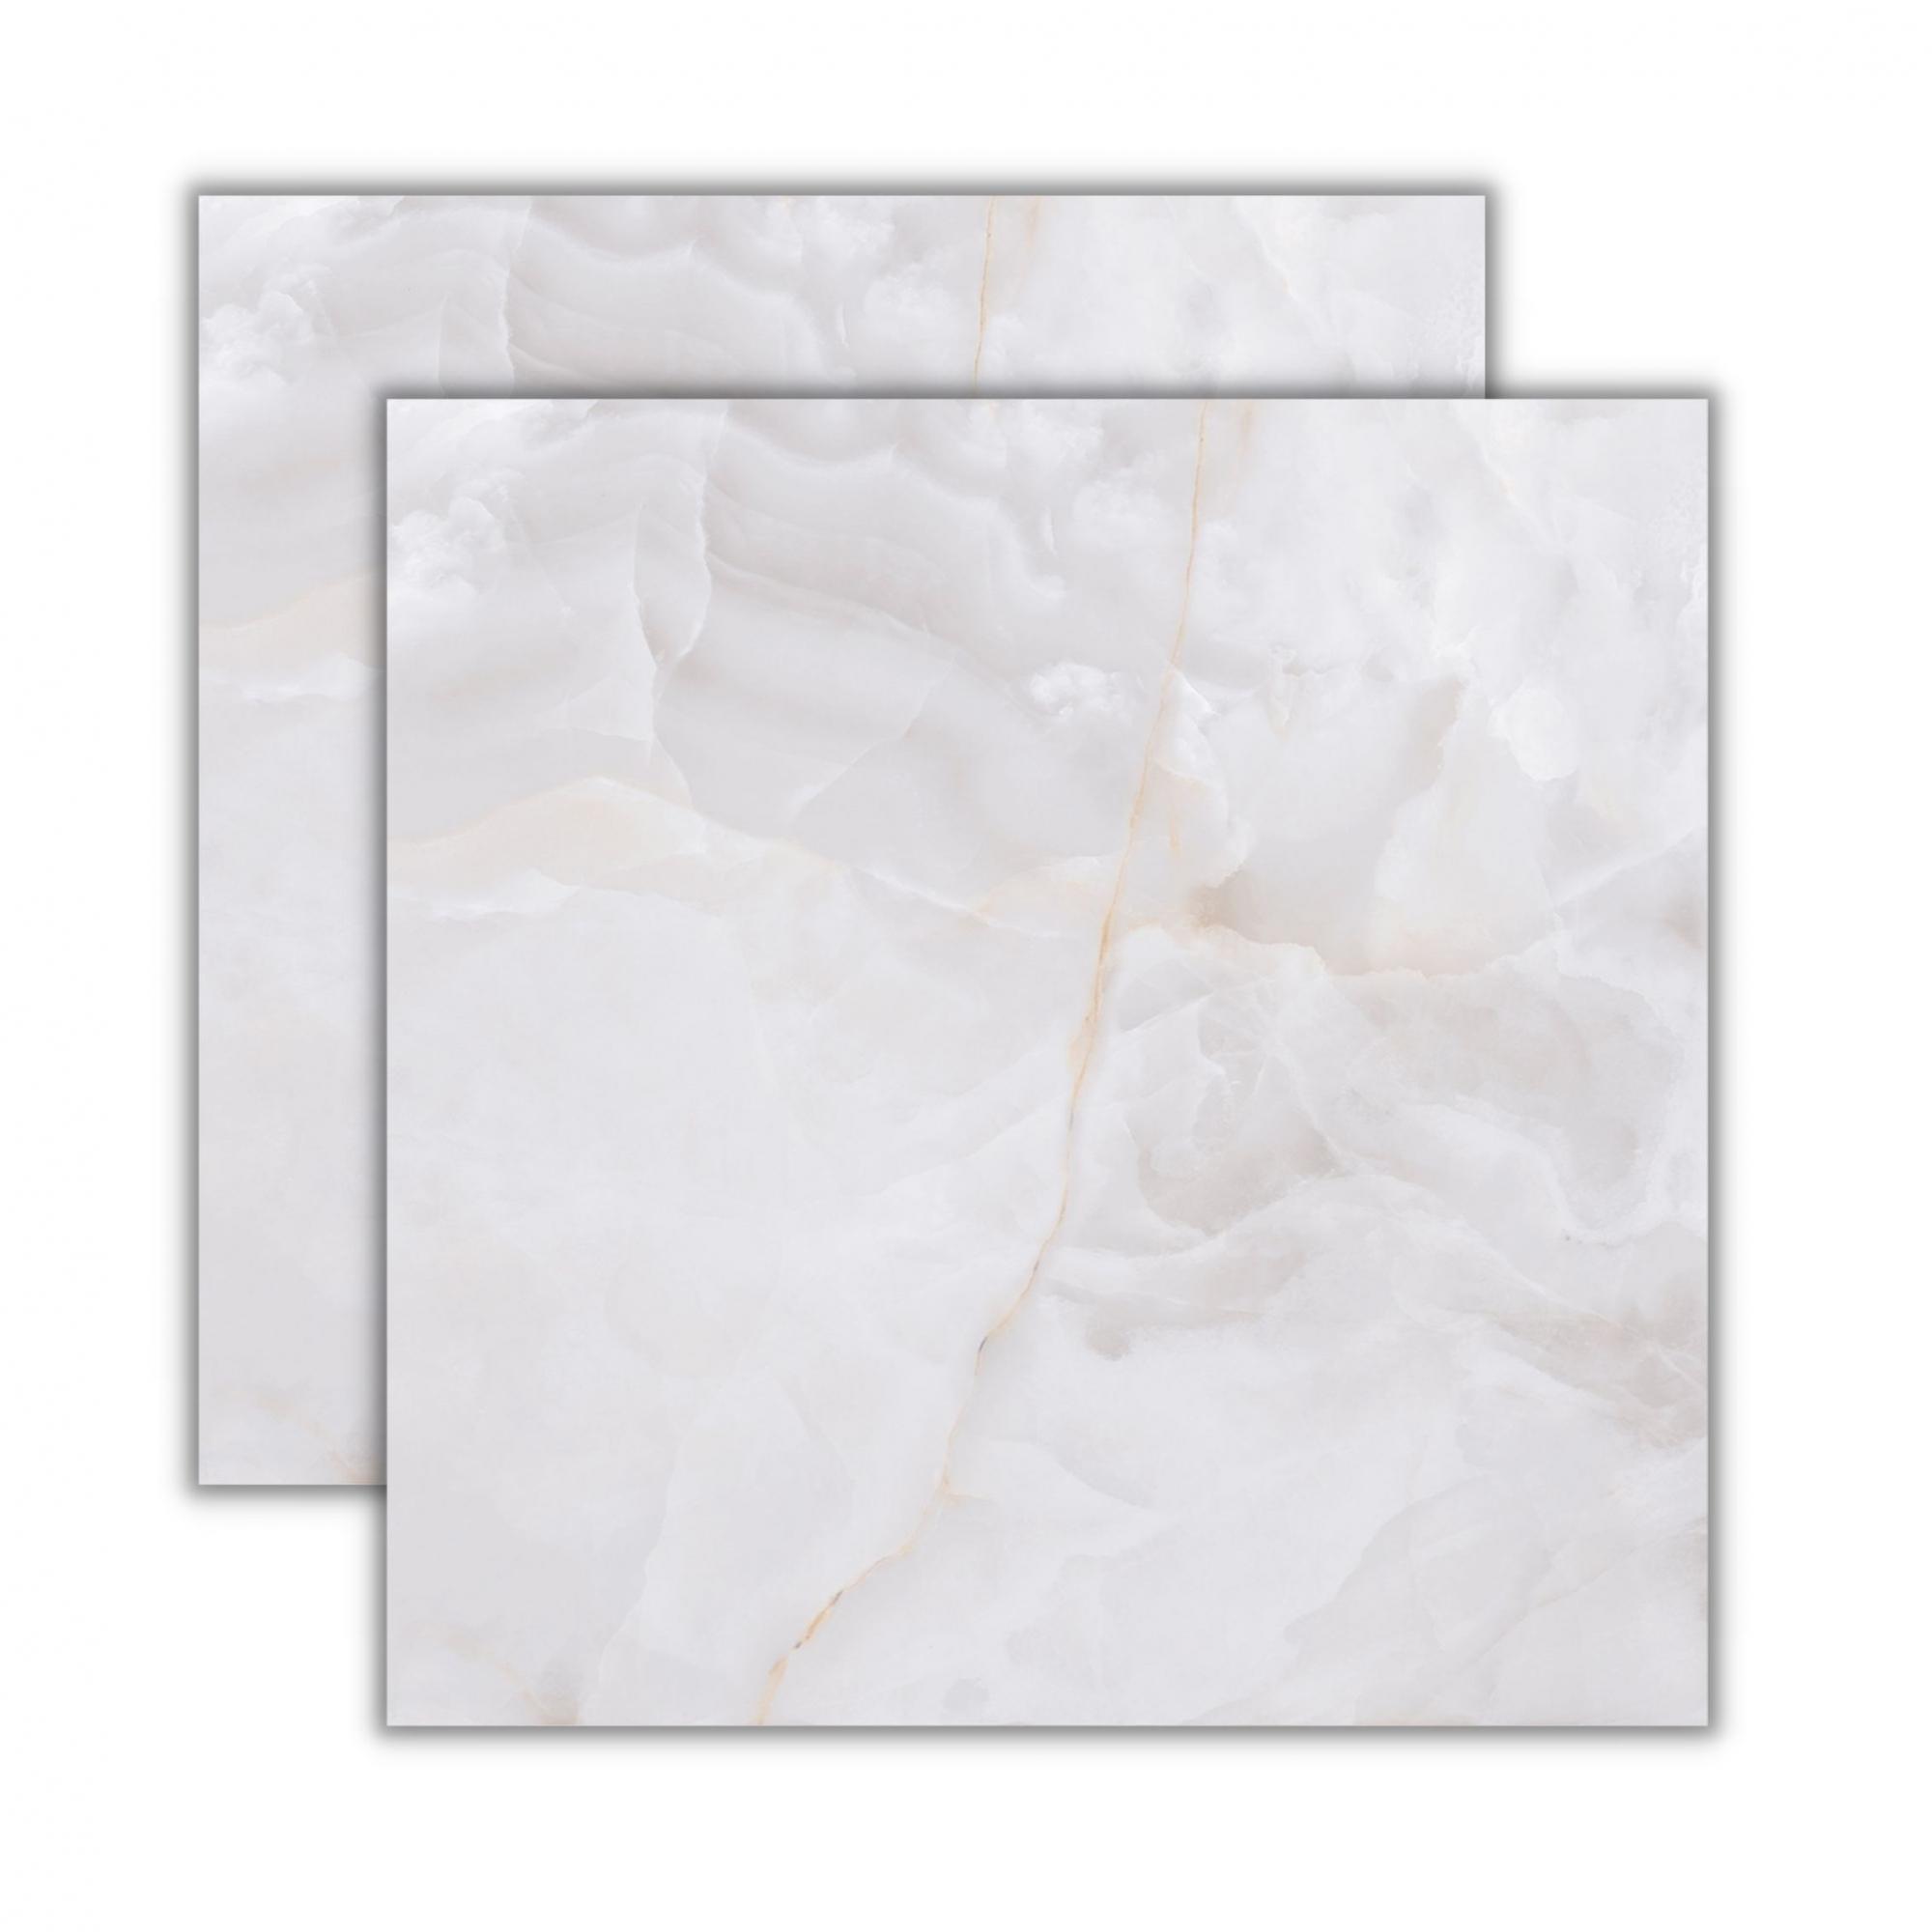 Onix Satin 90x90cm<br /><b>R$ 91,30 M² </b><br />Cx 2,40M² <b> R$ 219,12</b>